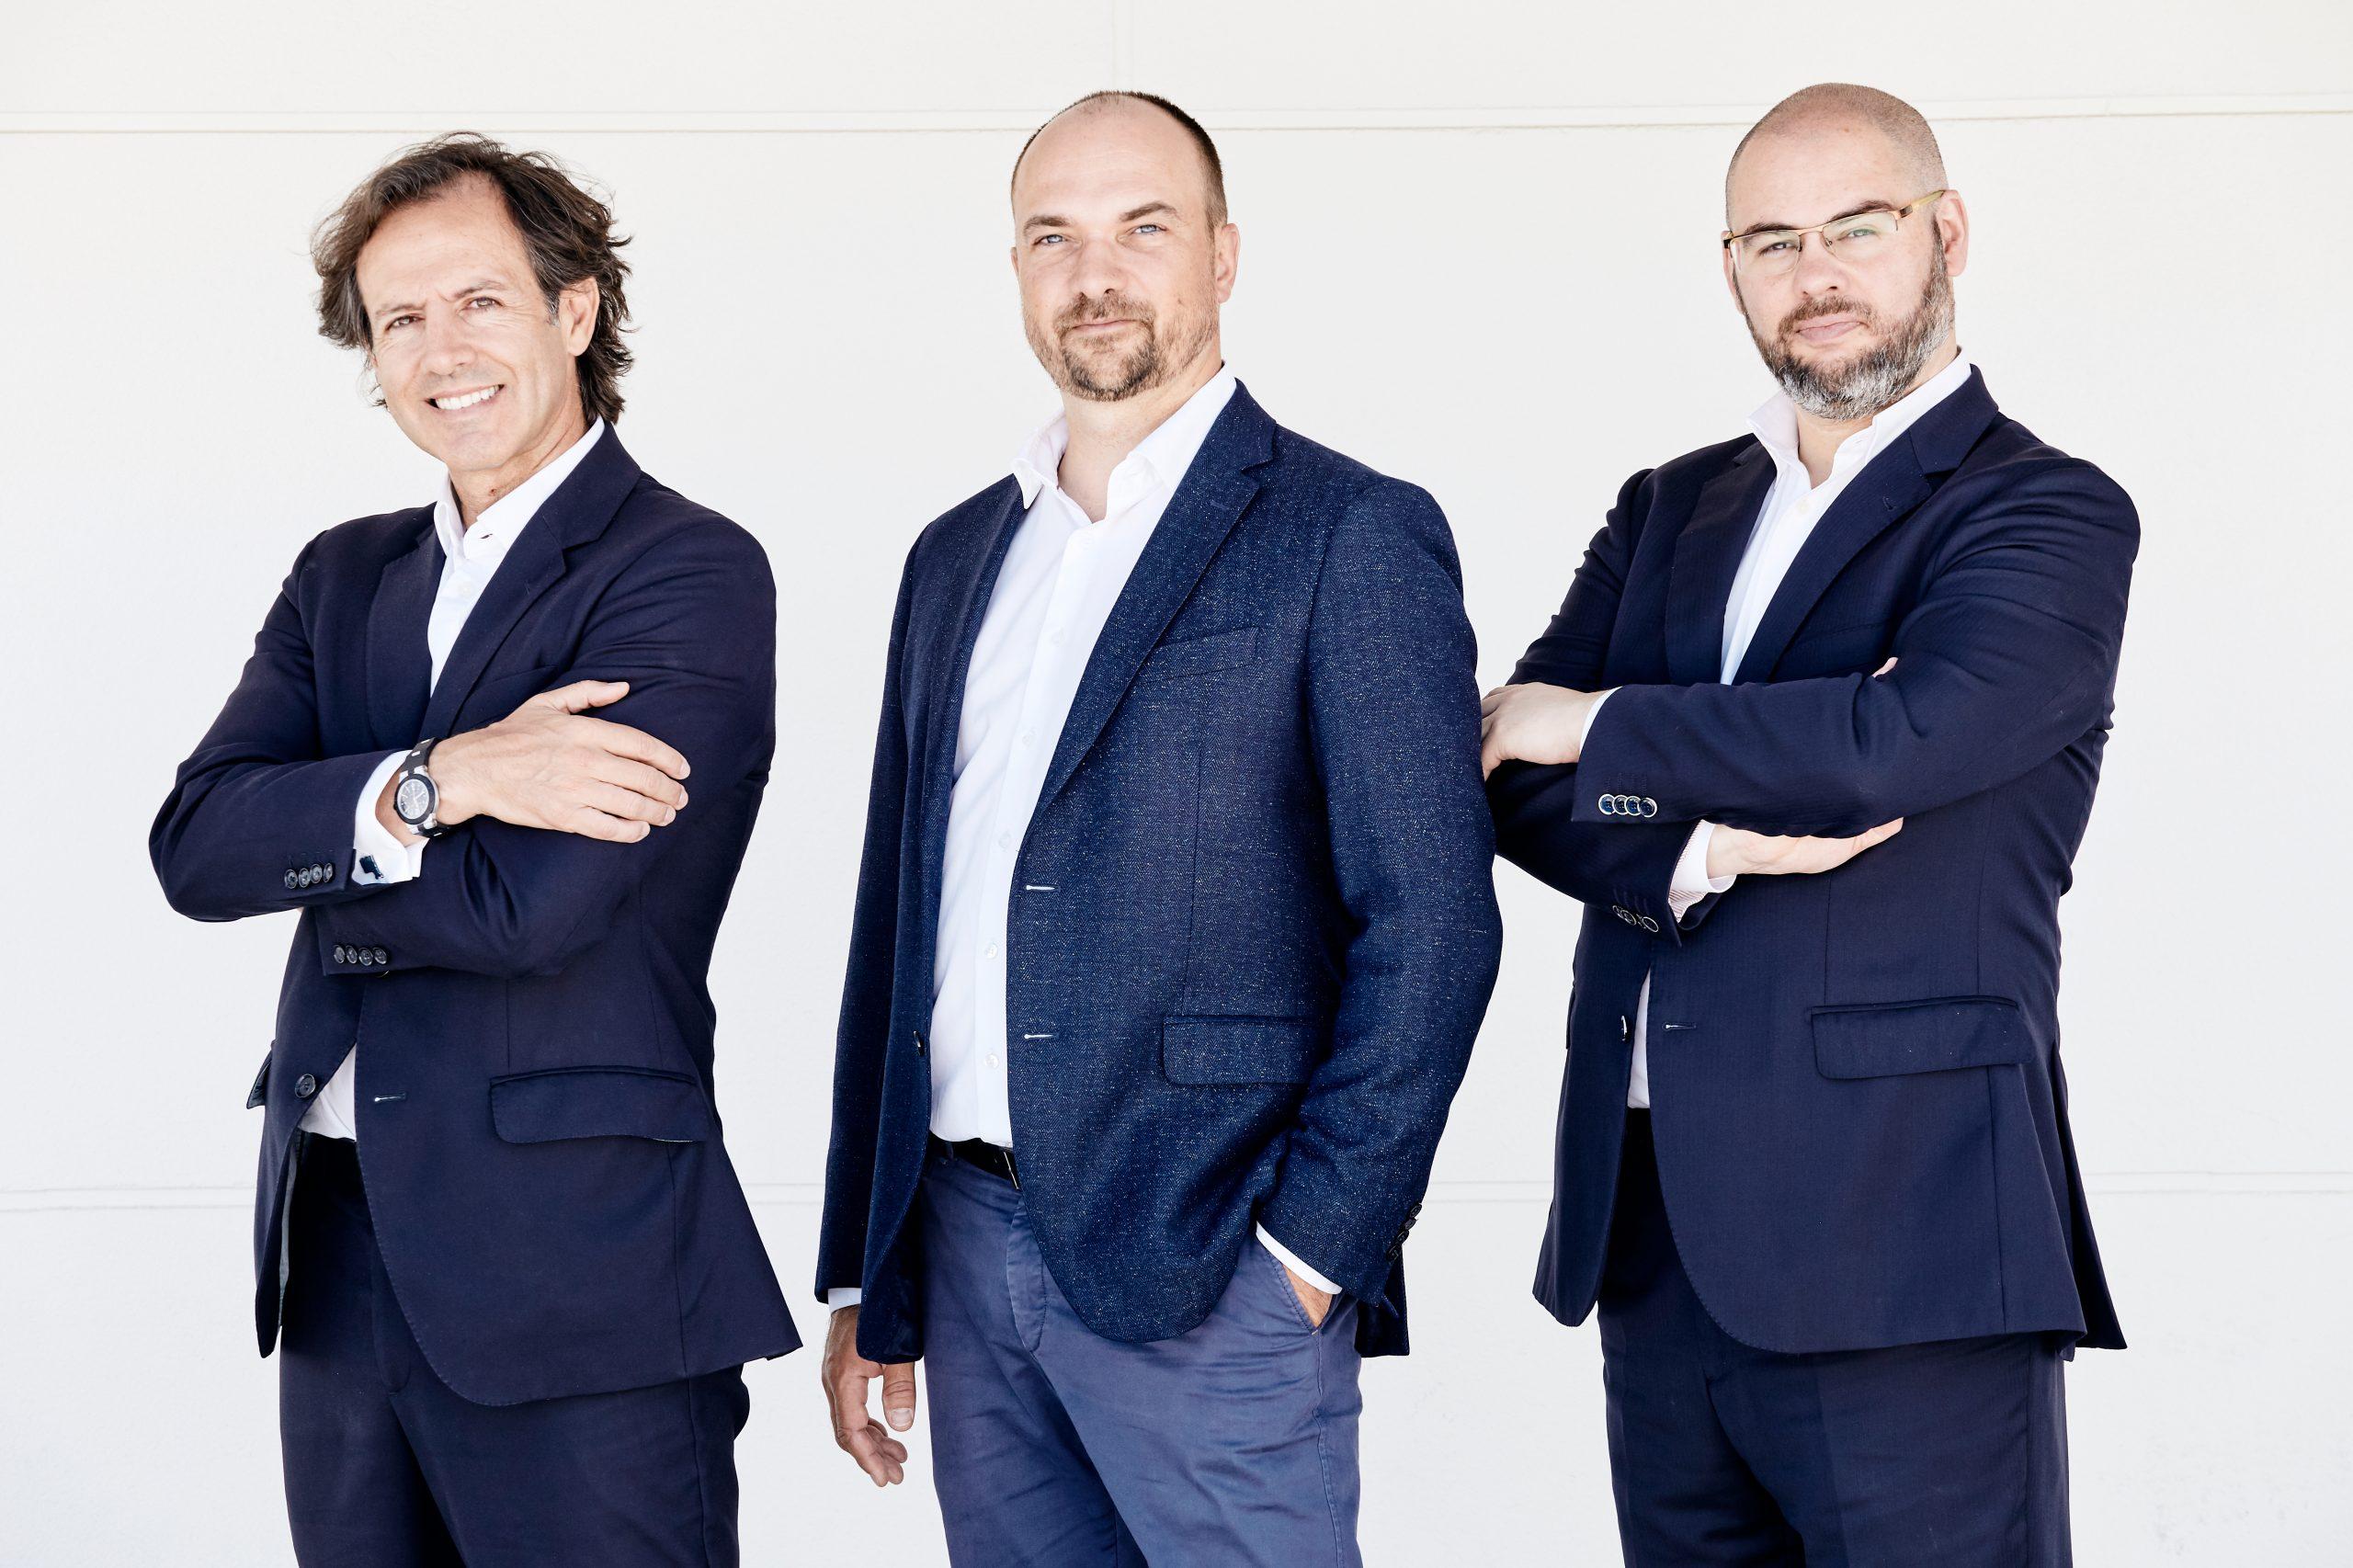 Indexa Capital arranca su expansión internacional en Bélgica